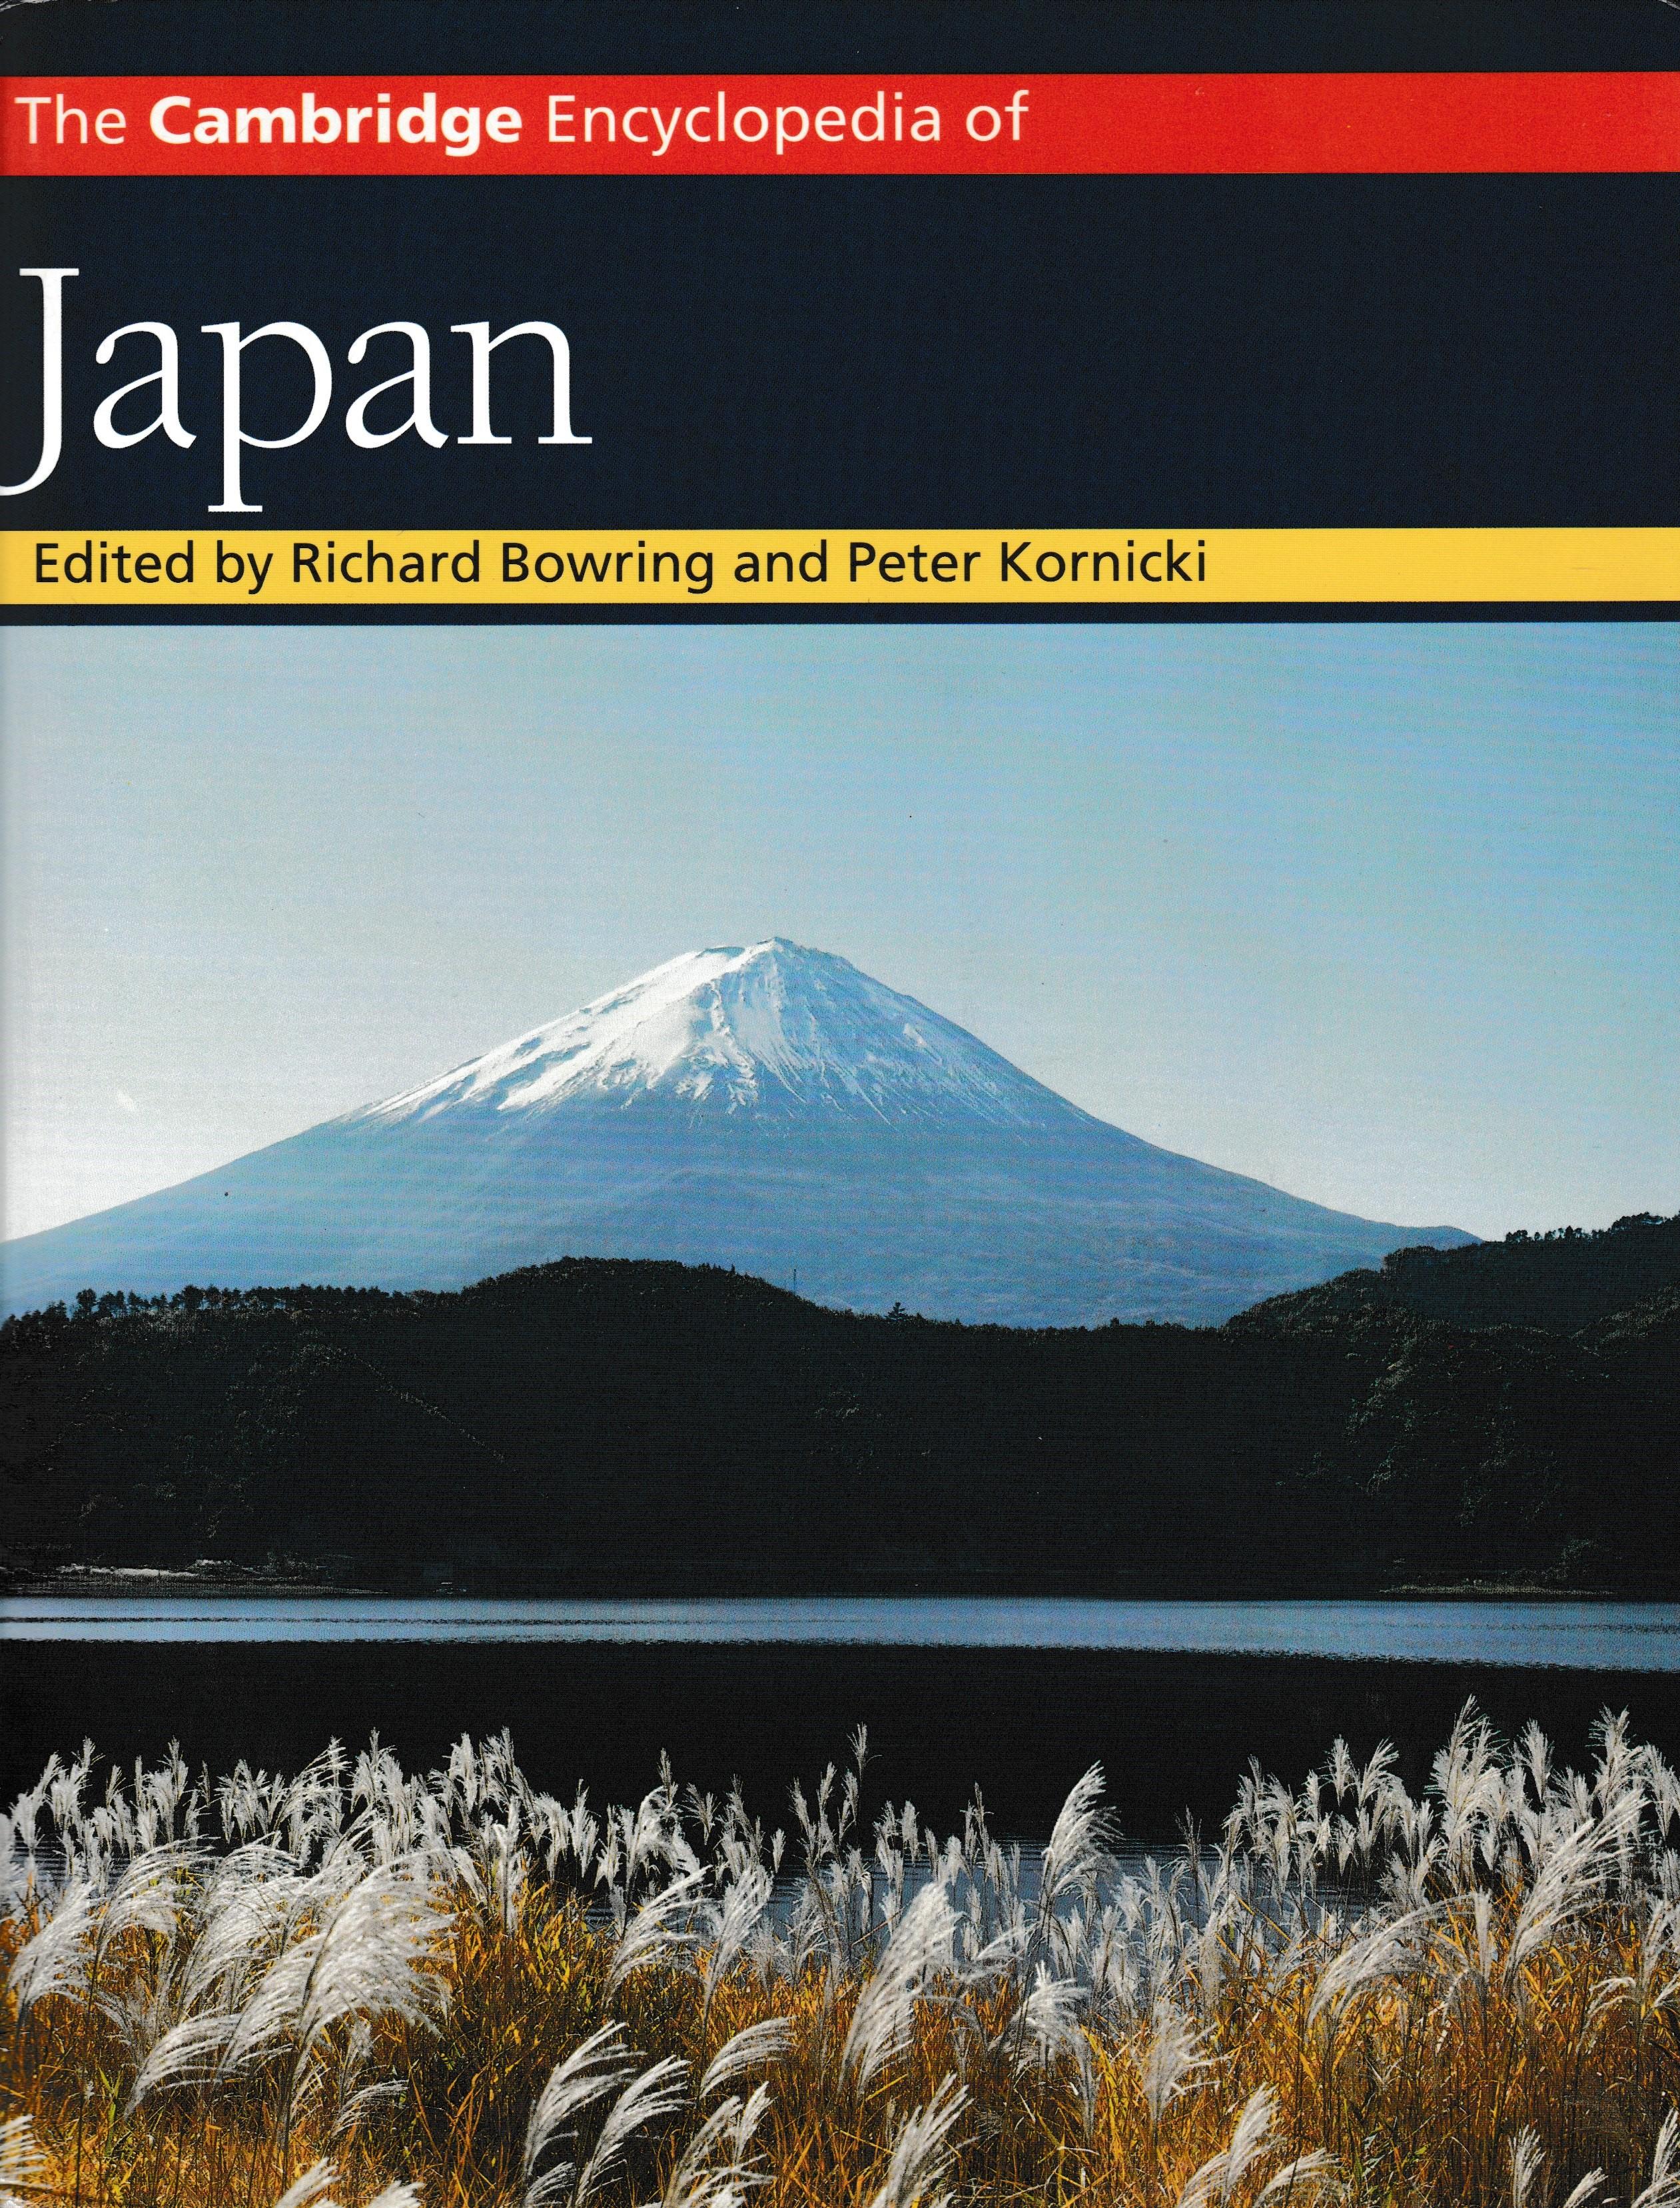 The Cambridge Encyclopedia of Japan